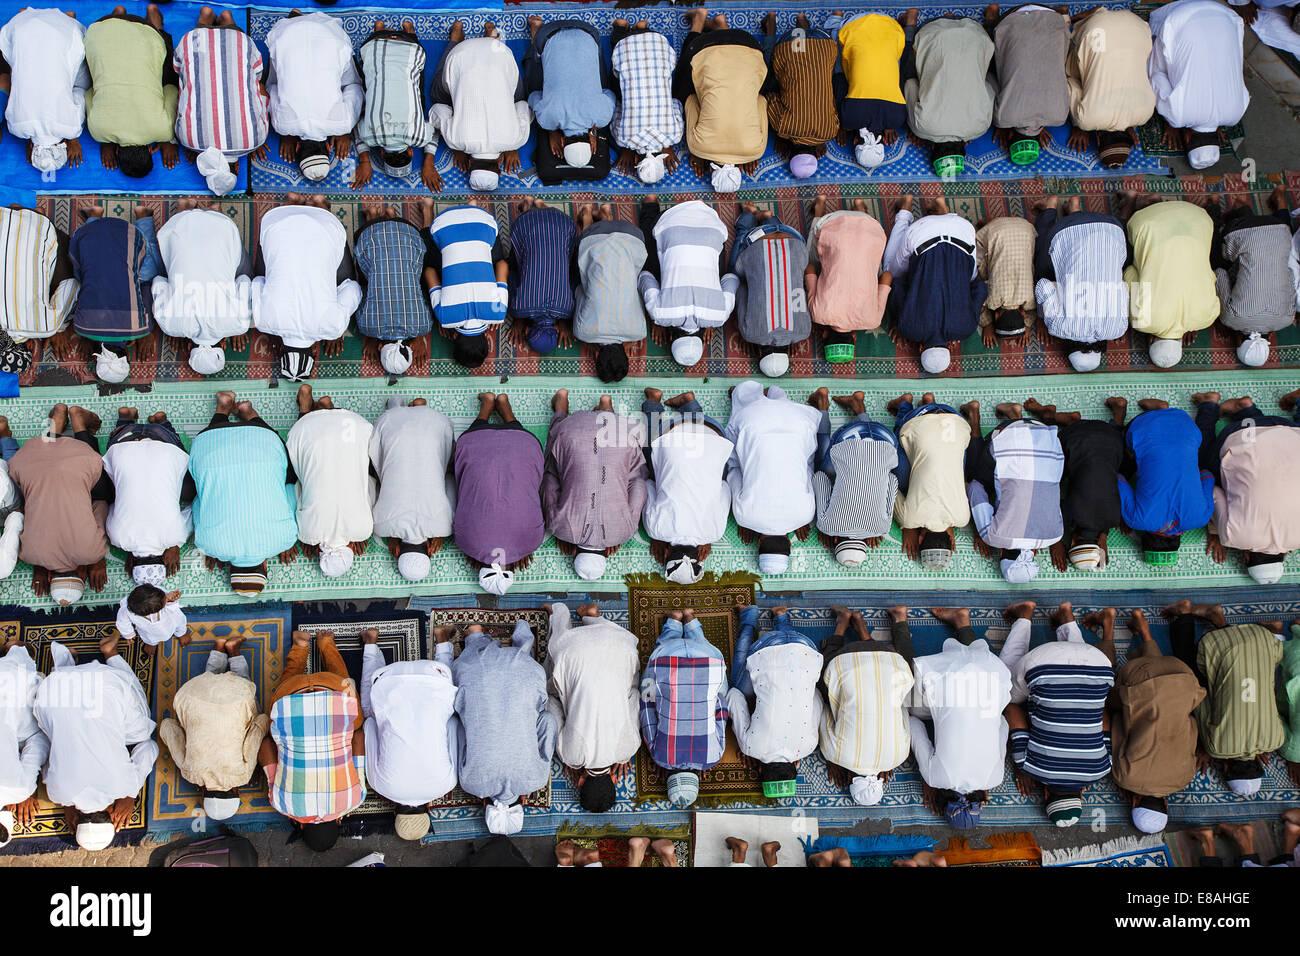 Muslimische Freitag Salat Gebet Jumu außerhalb Moschee Jama Masjid in Bandra, Mumbai, Indien. Stockbild